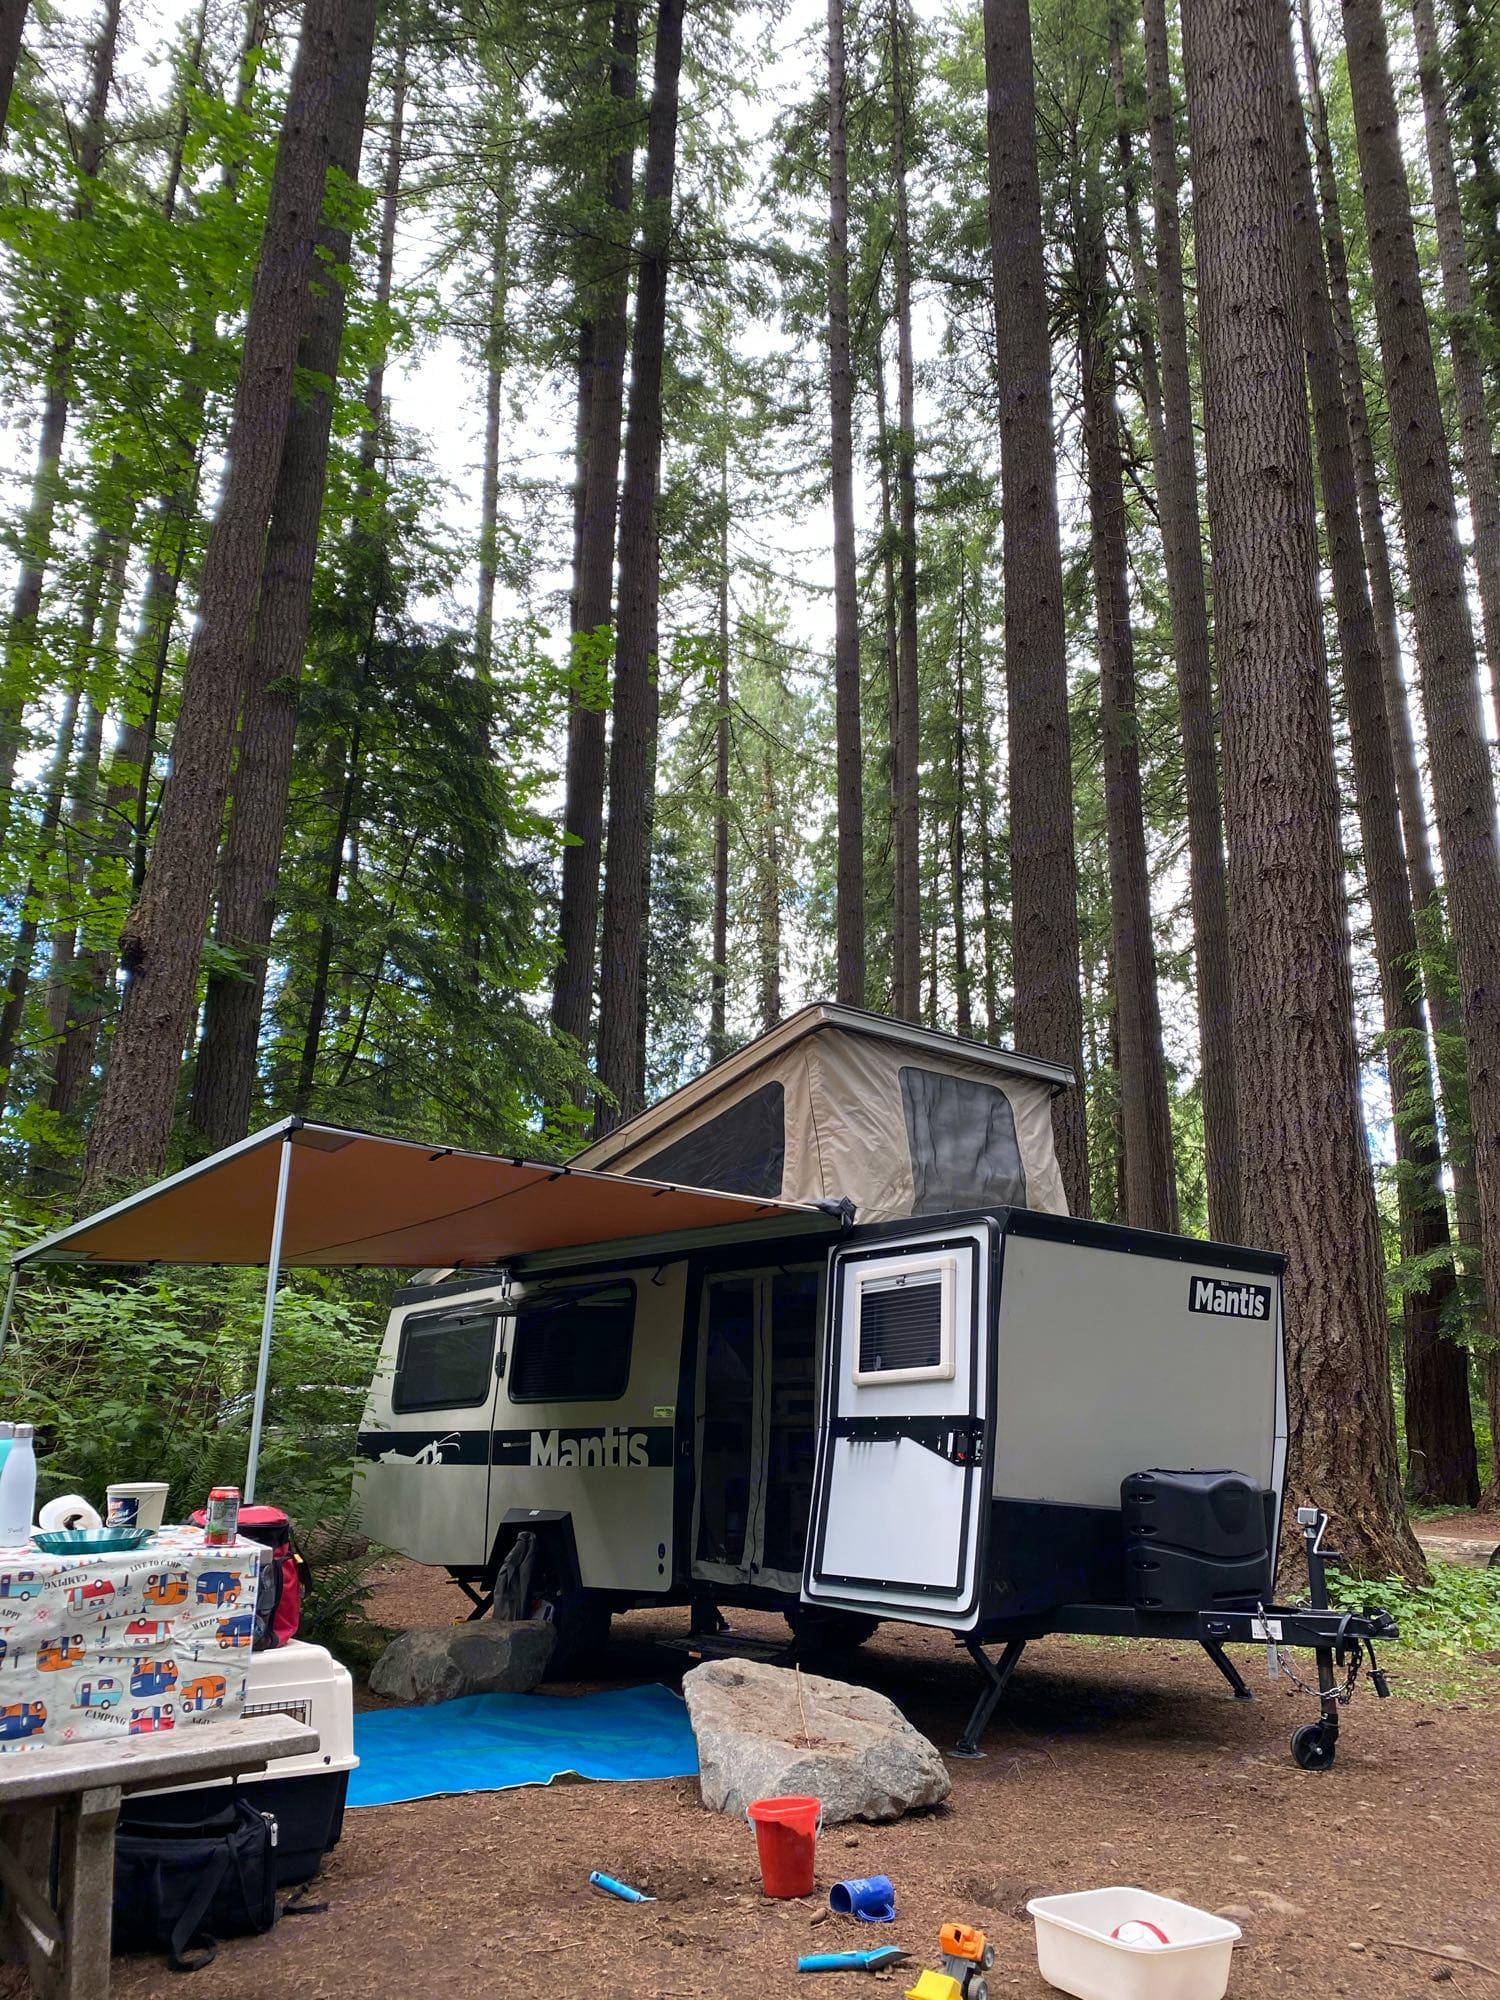 Setup with awning. TAXA Outdoors Mantis Camper 2019